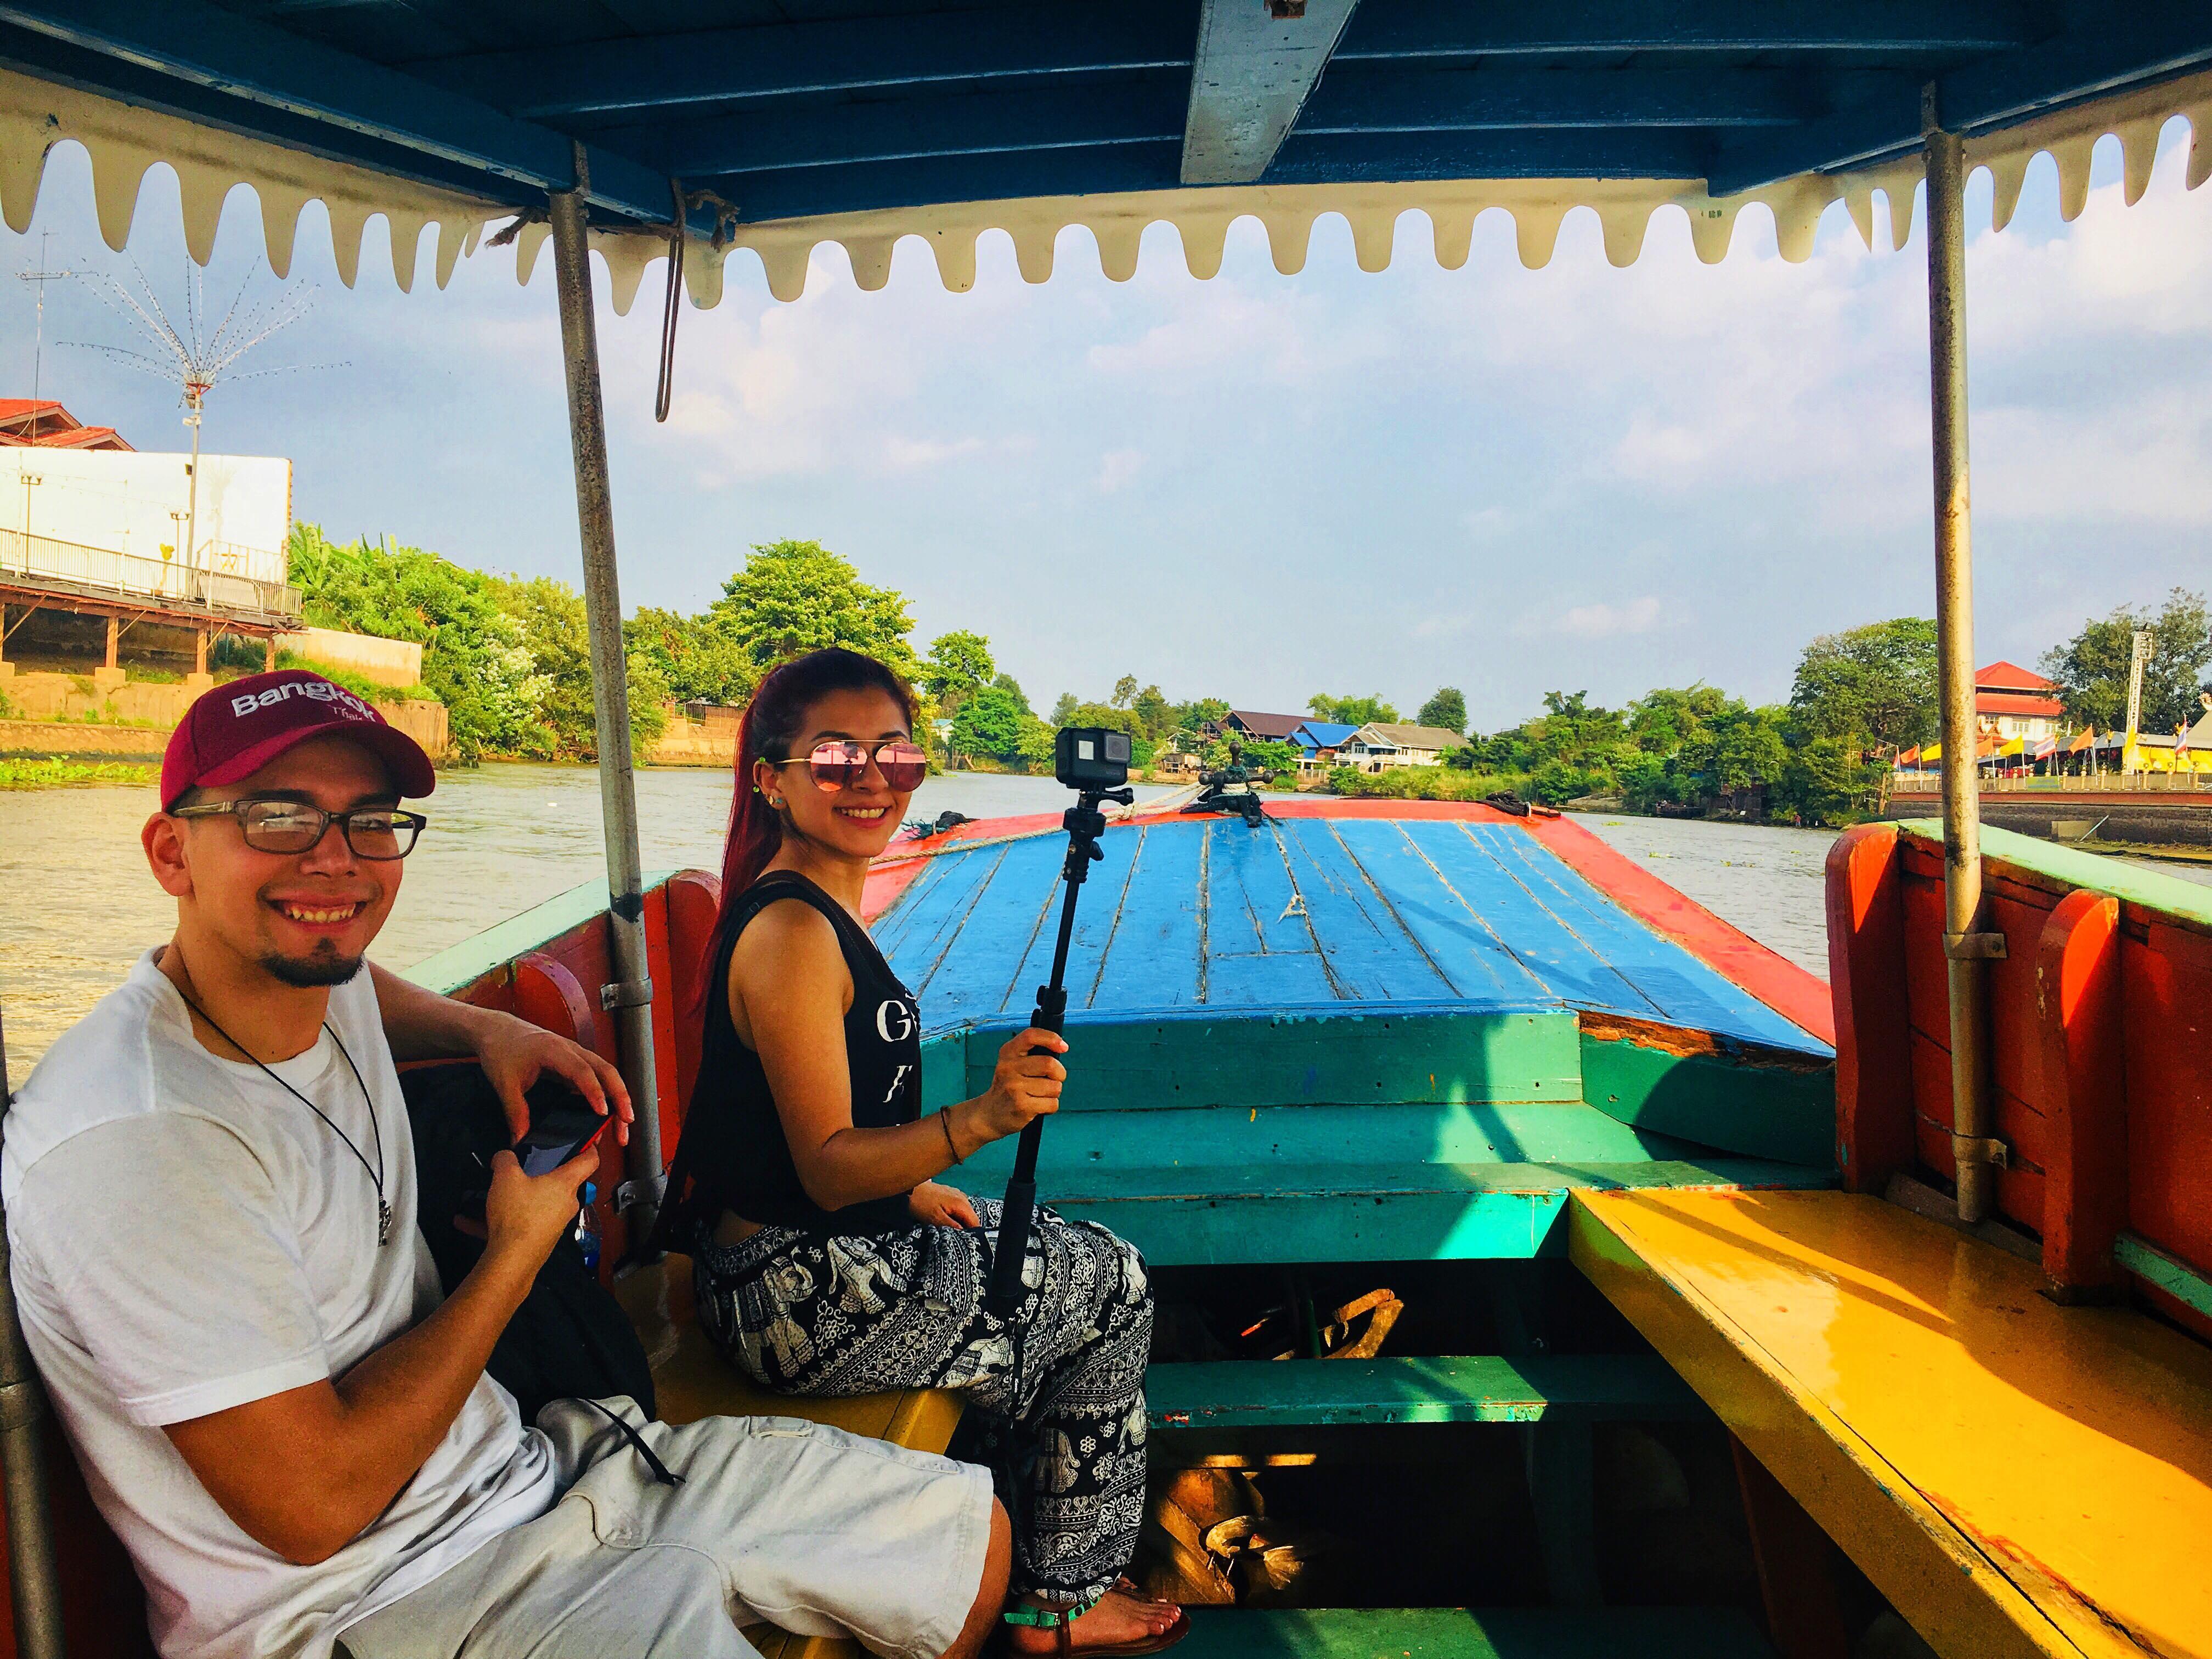 Sandyindee Travel4